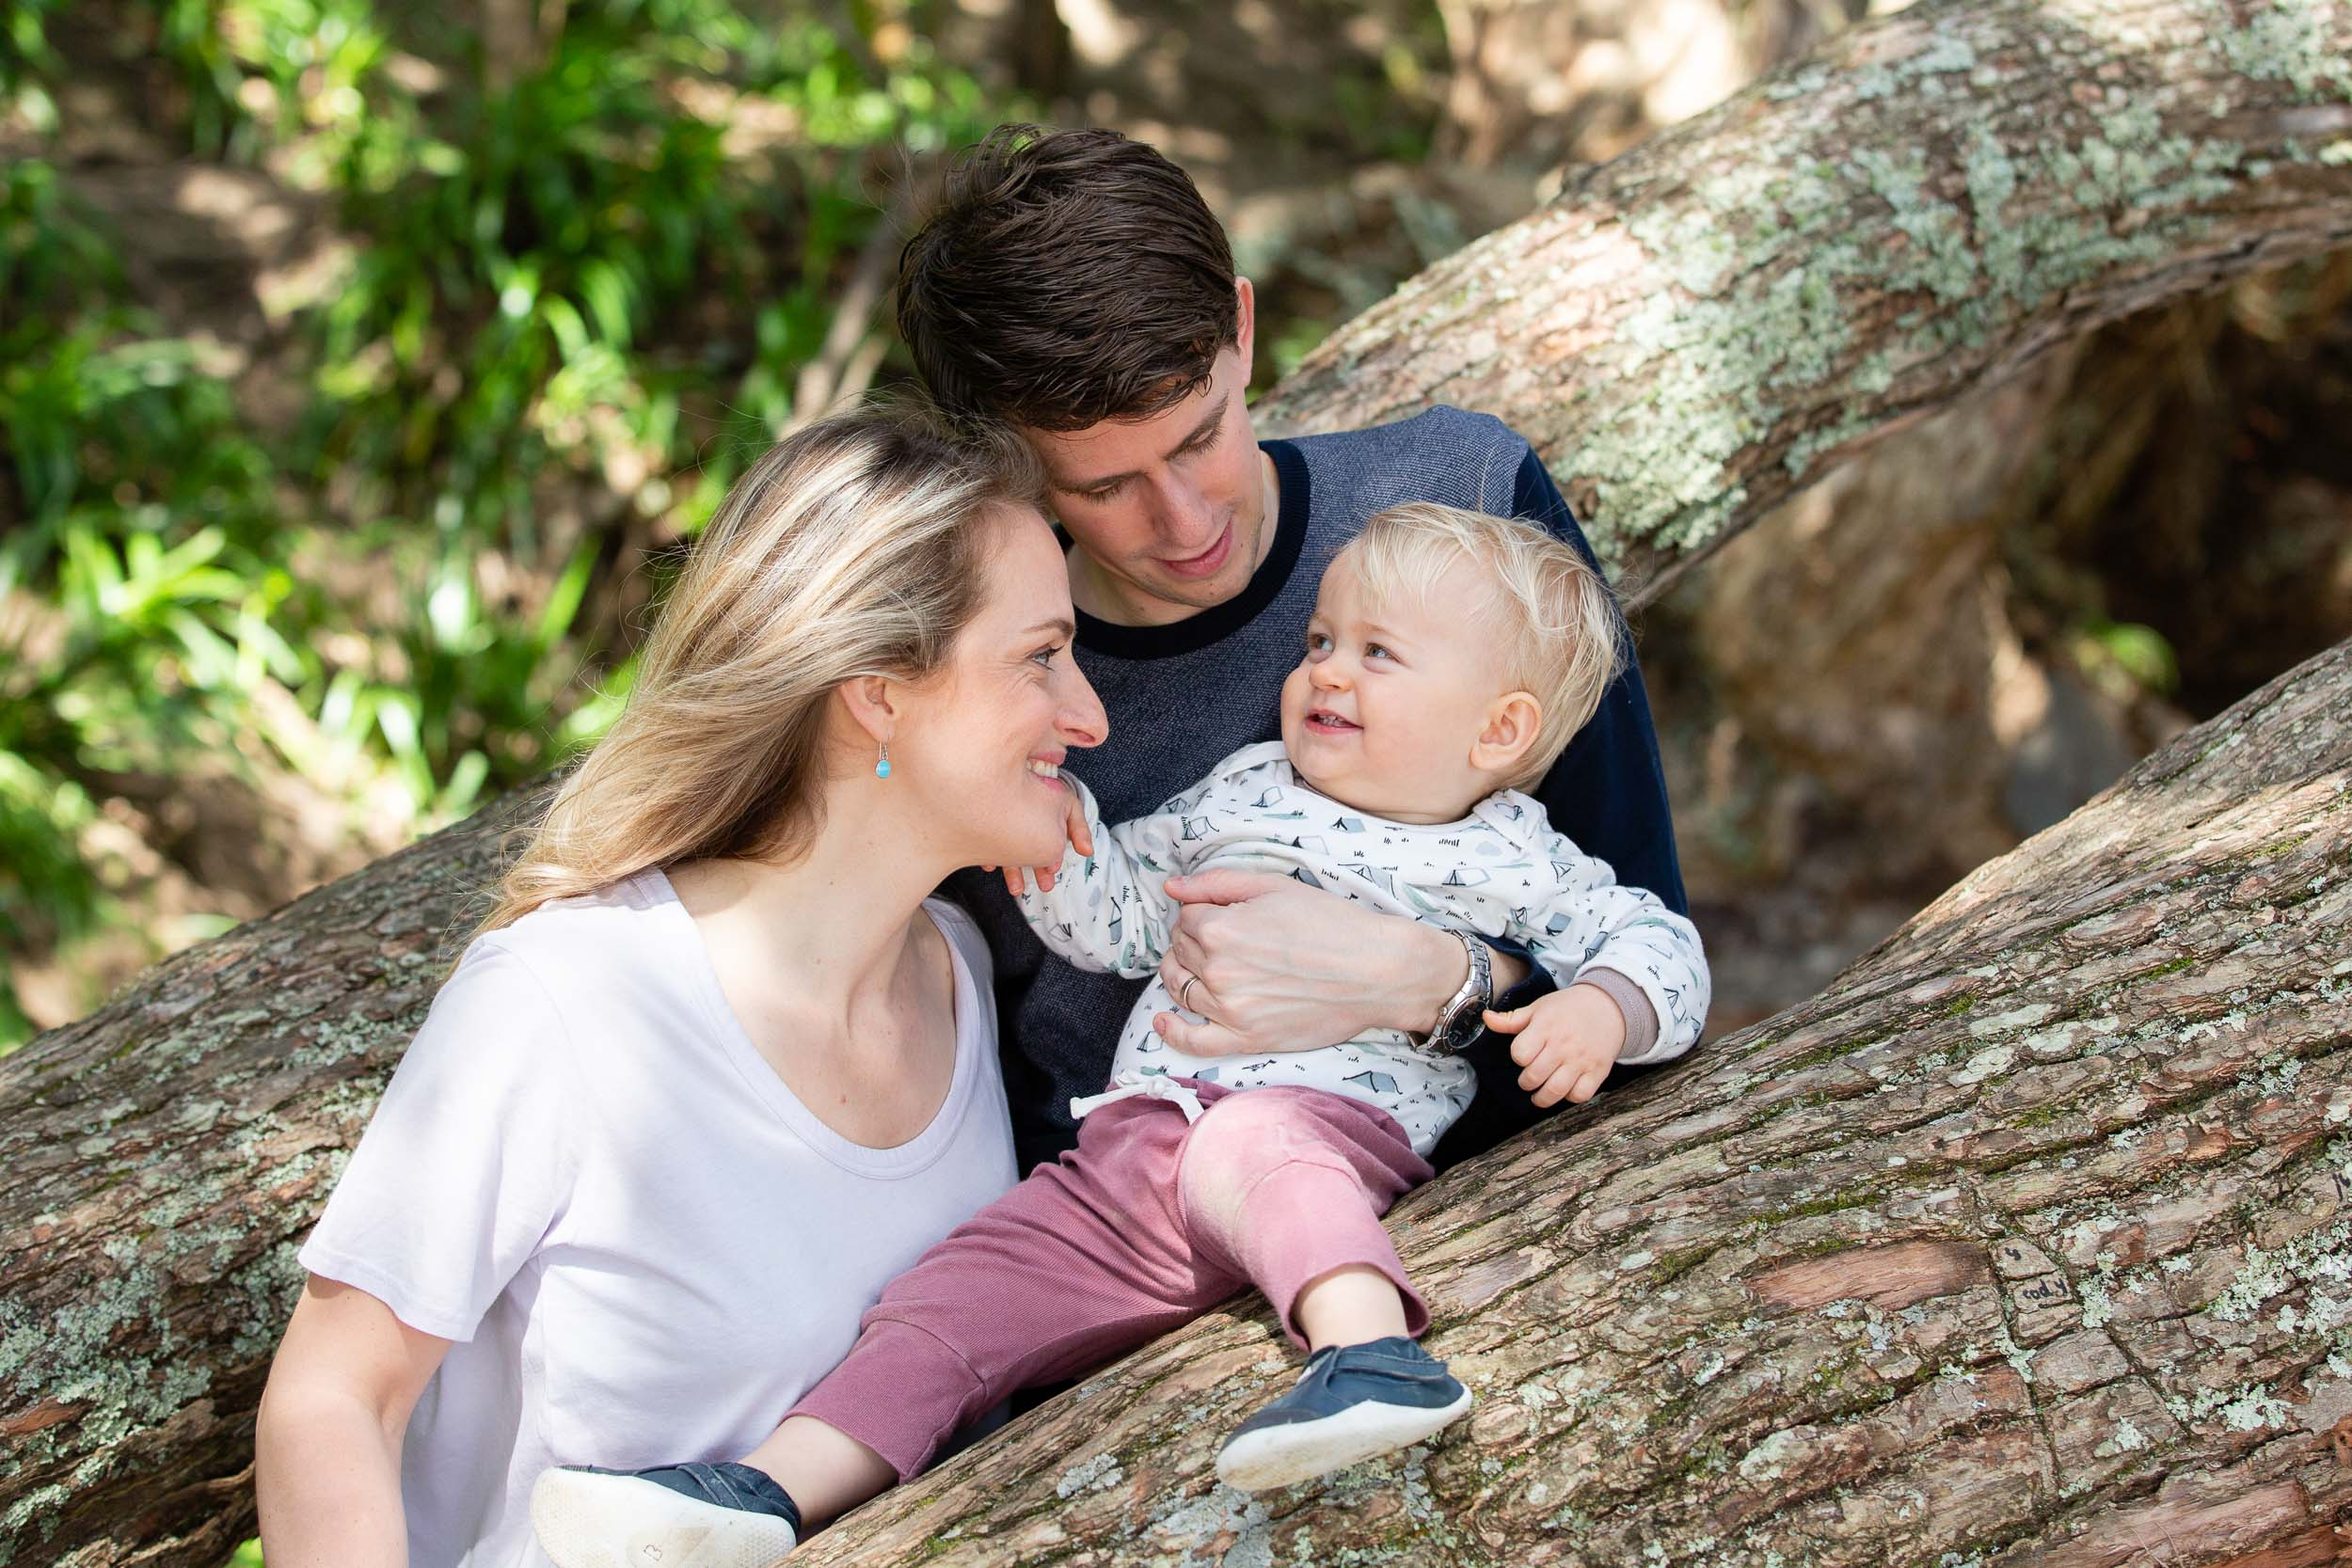 Aucklandfamilyphotographer (13 of 14).jpg